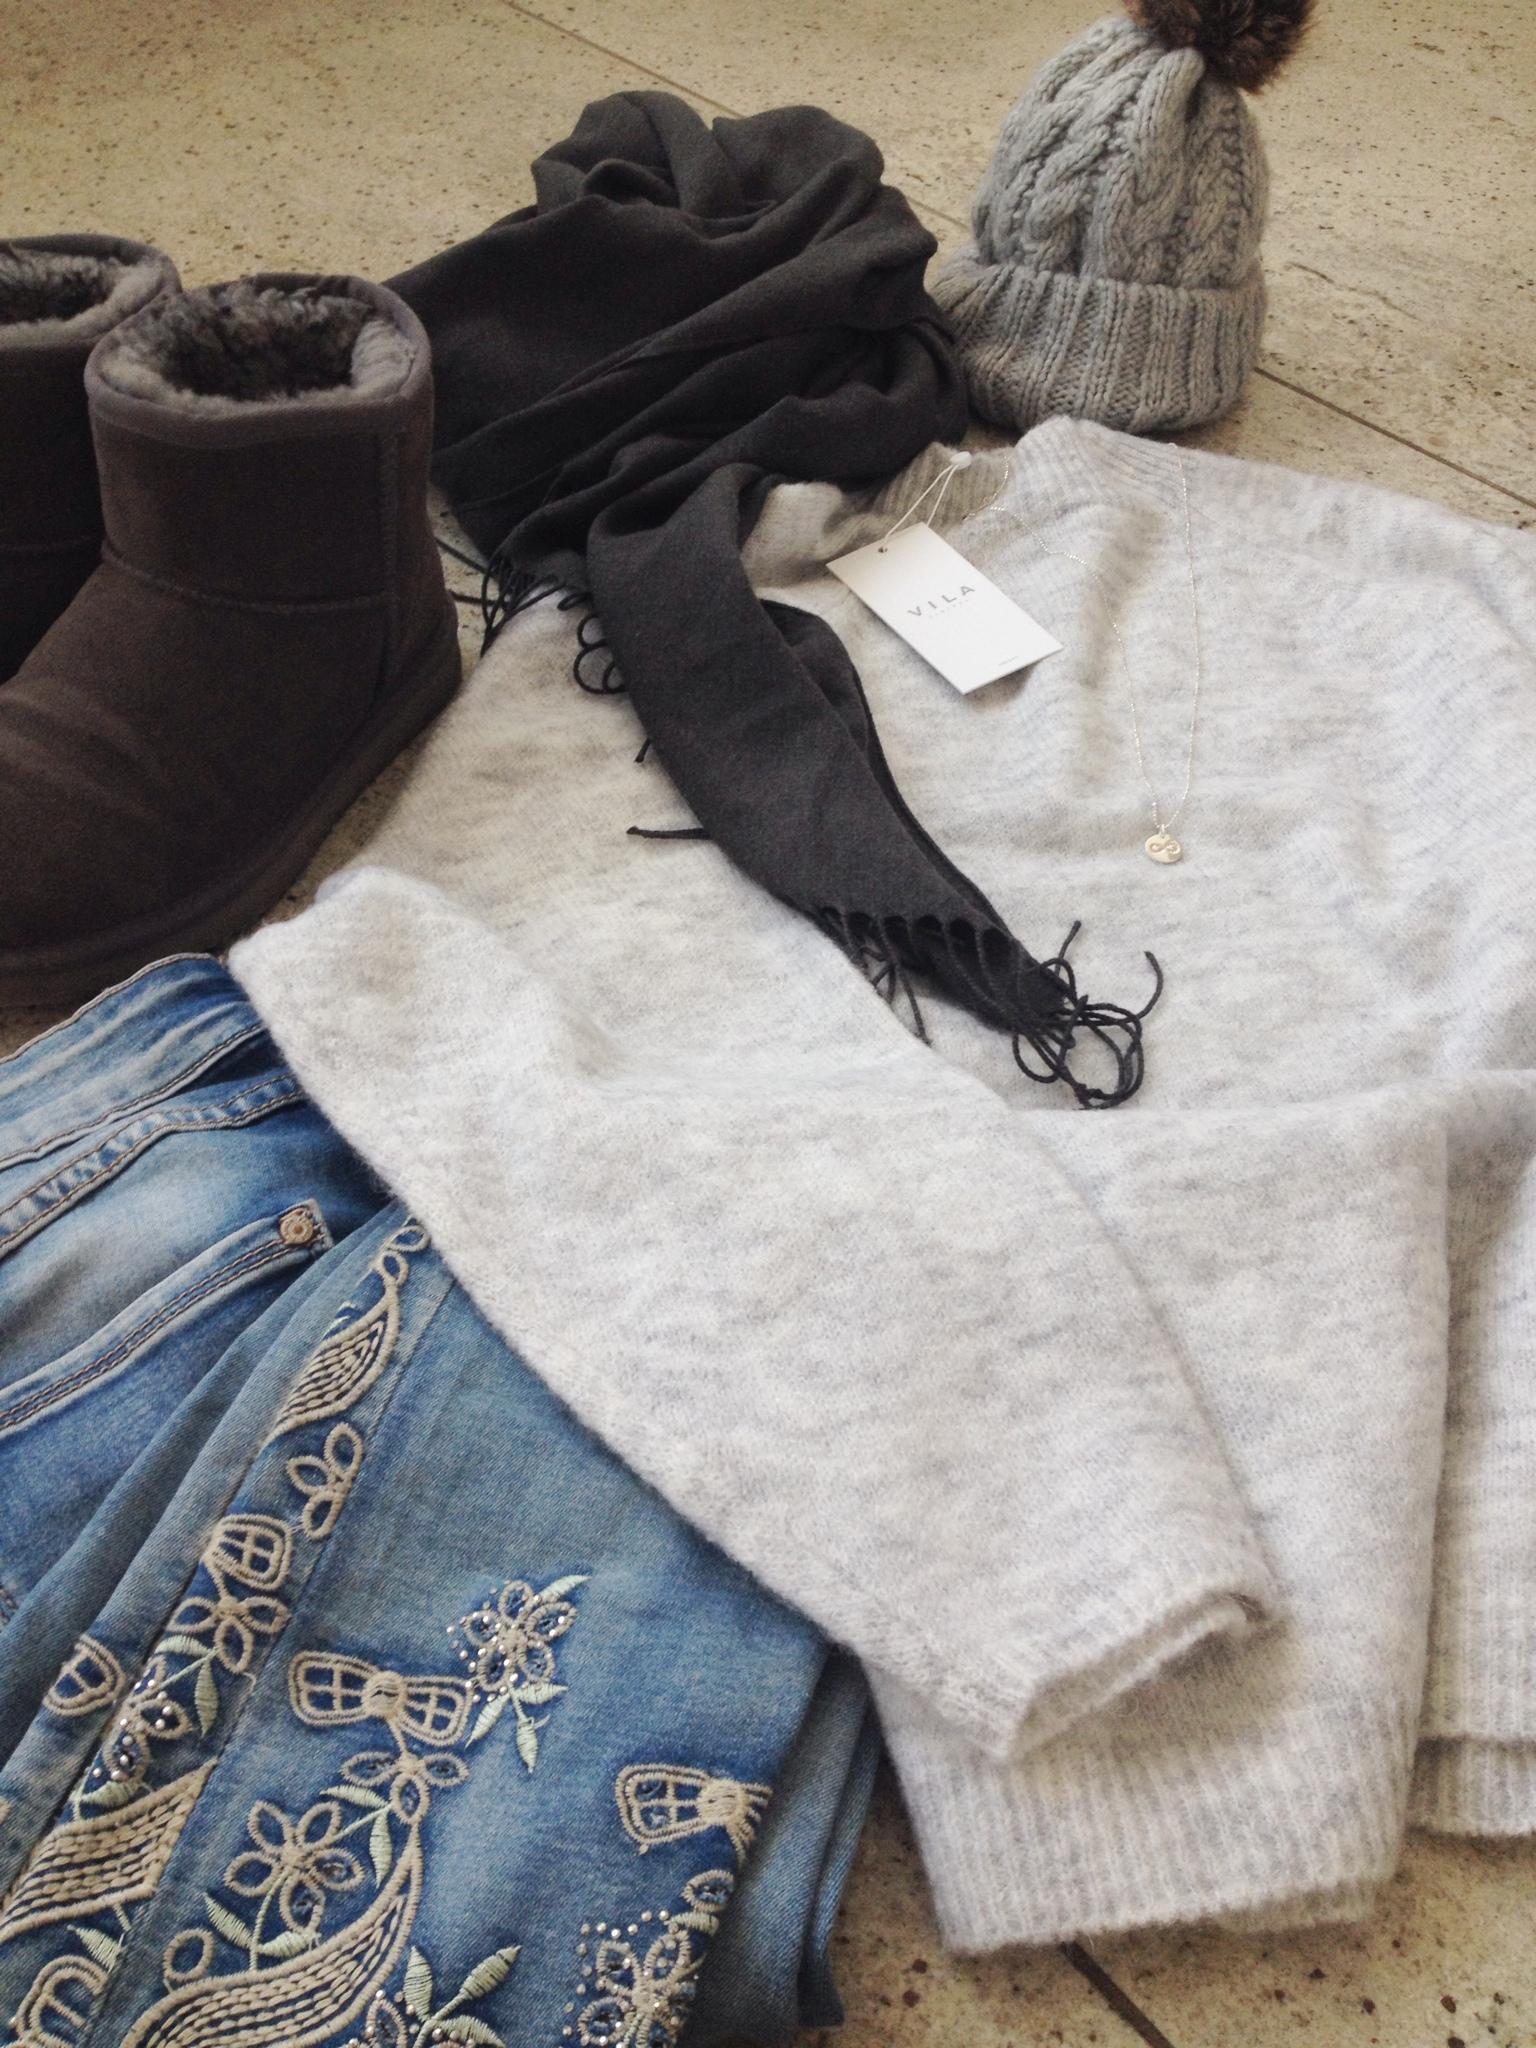 Pullover im Sale, Mamablog, Modeblog, Modemama, Zalando Sale, Winterlook, Winterpulli, Strickpullover, Mamastyle